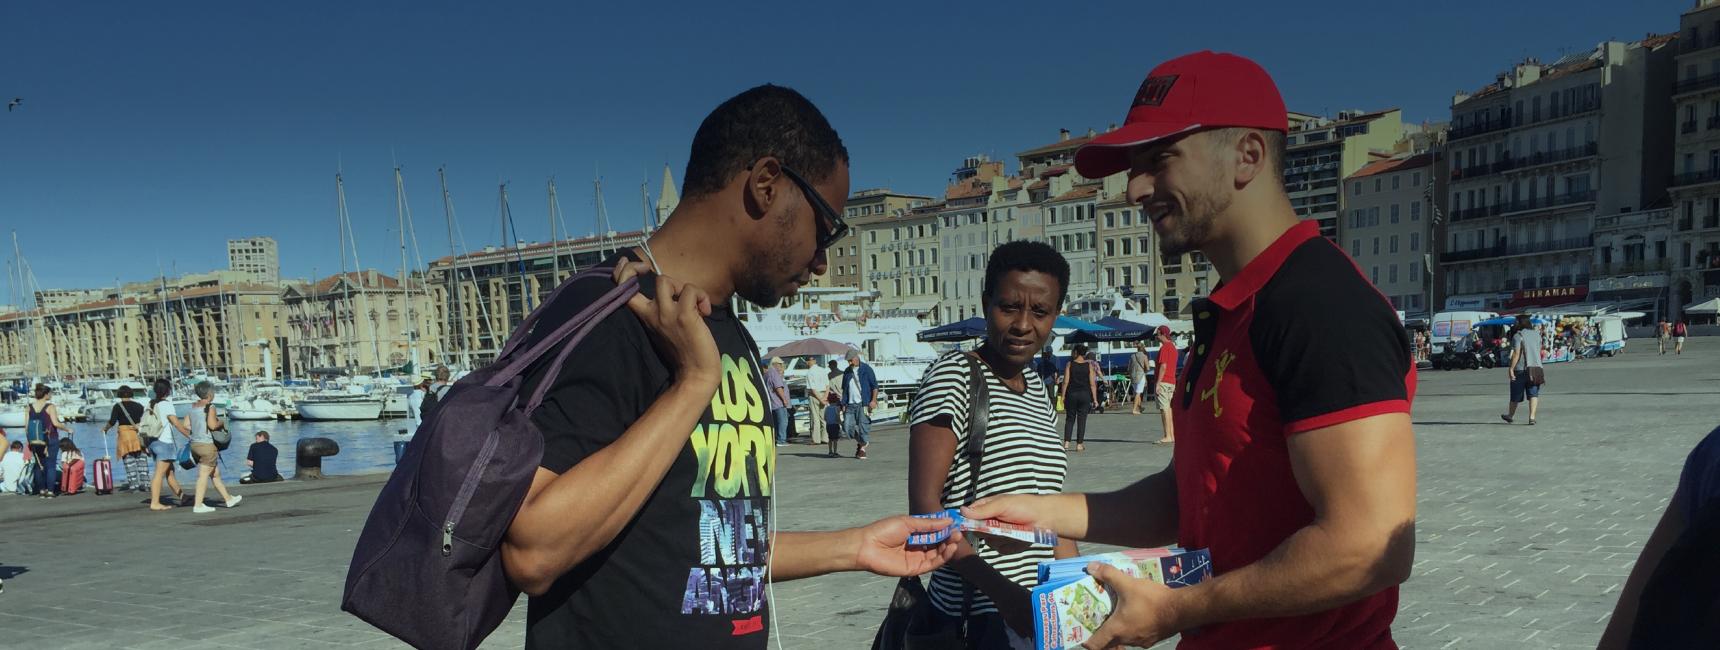 Parc Spirou - Street Marketing - Keemia agence marketing local à Marseille